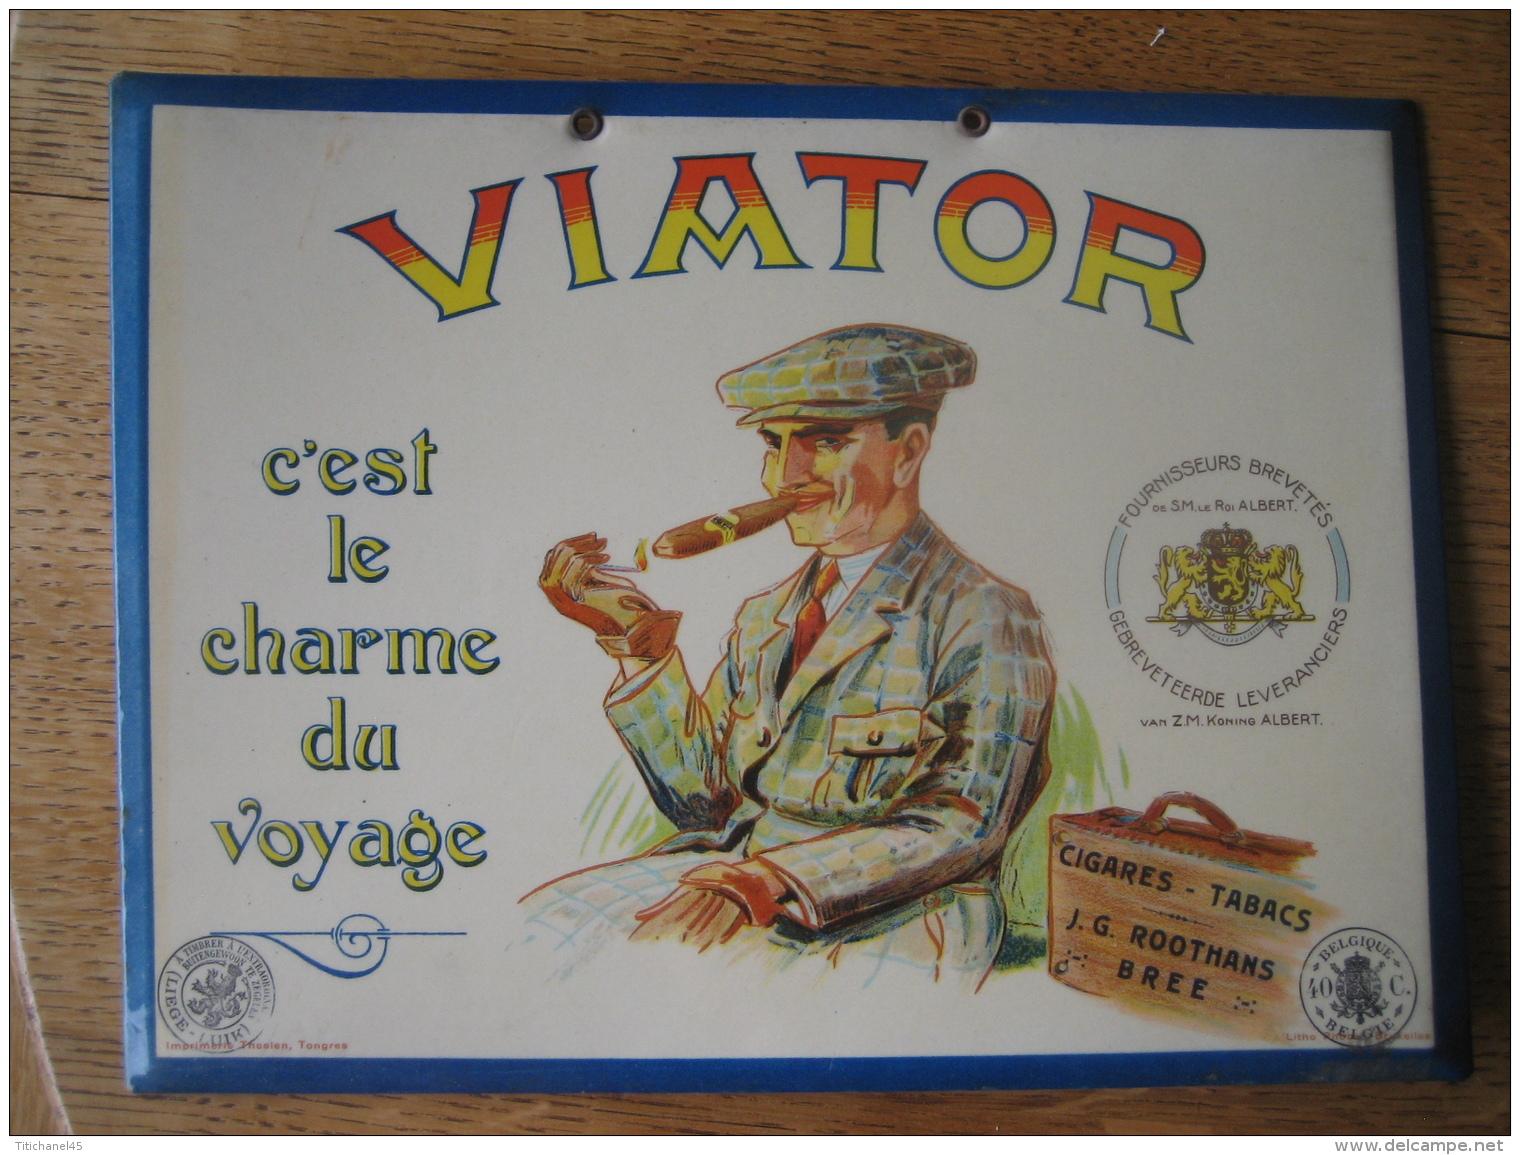 "Ancien Glaçoïde Publicitaire Original  - J.G ROOTHANS, BREE - Cigares, Tabacs ""VIATOR"" - Lithographie PHOBEL, BRUXELLES - Plaques En Carton"